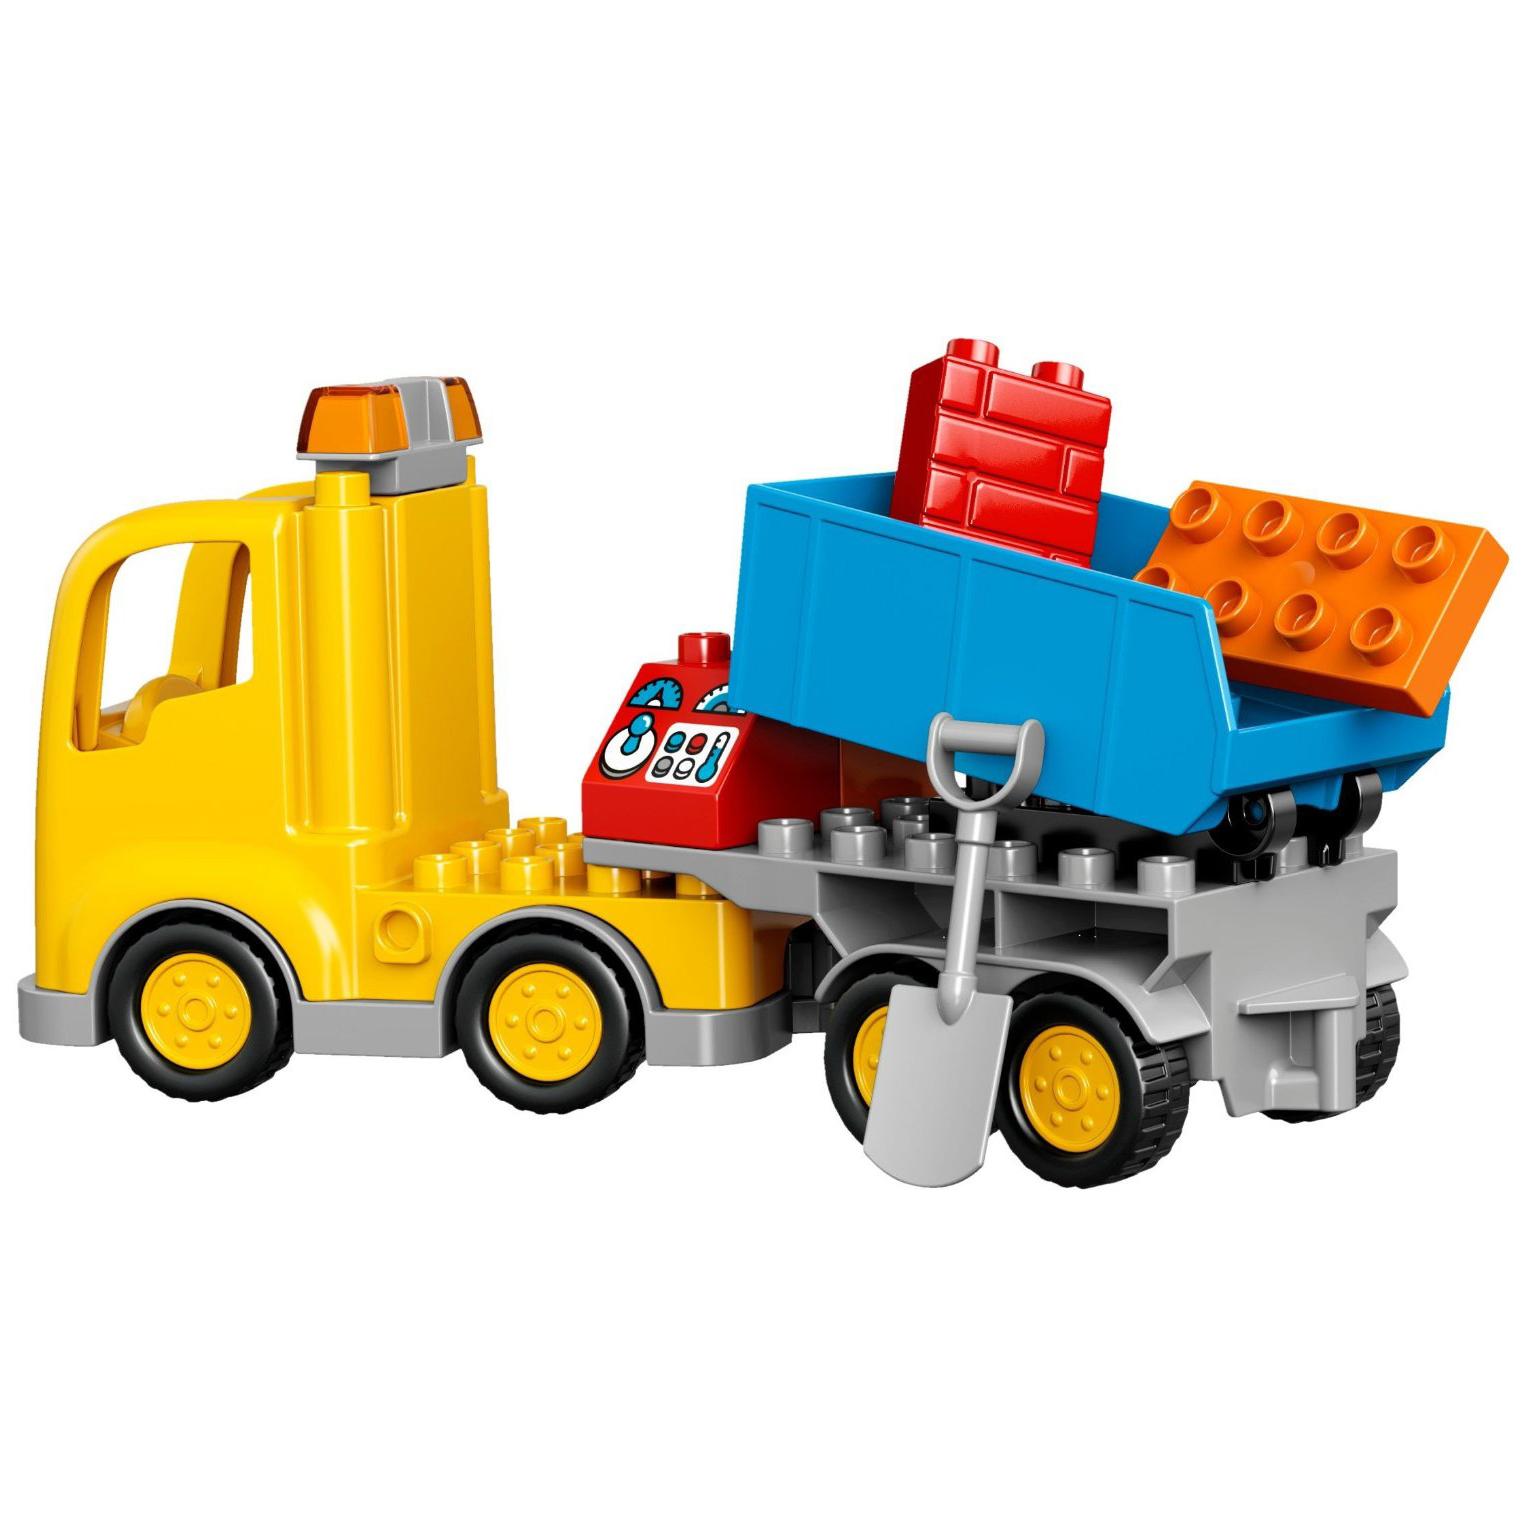 LEGO Duplo Big Construction Site Building Blocks for Ages 2 5 67